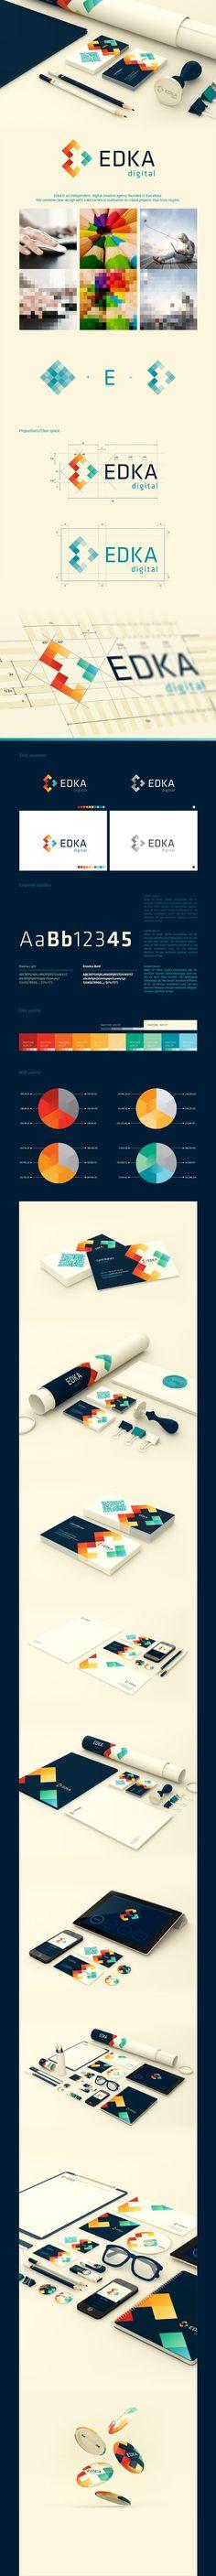 50+ Brand Identity Design Examples That Impress http://arcreactions.com/